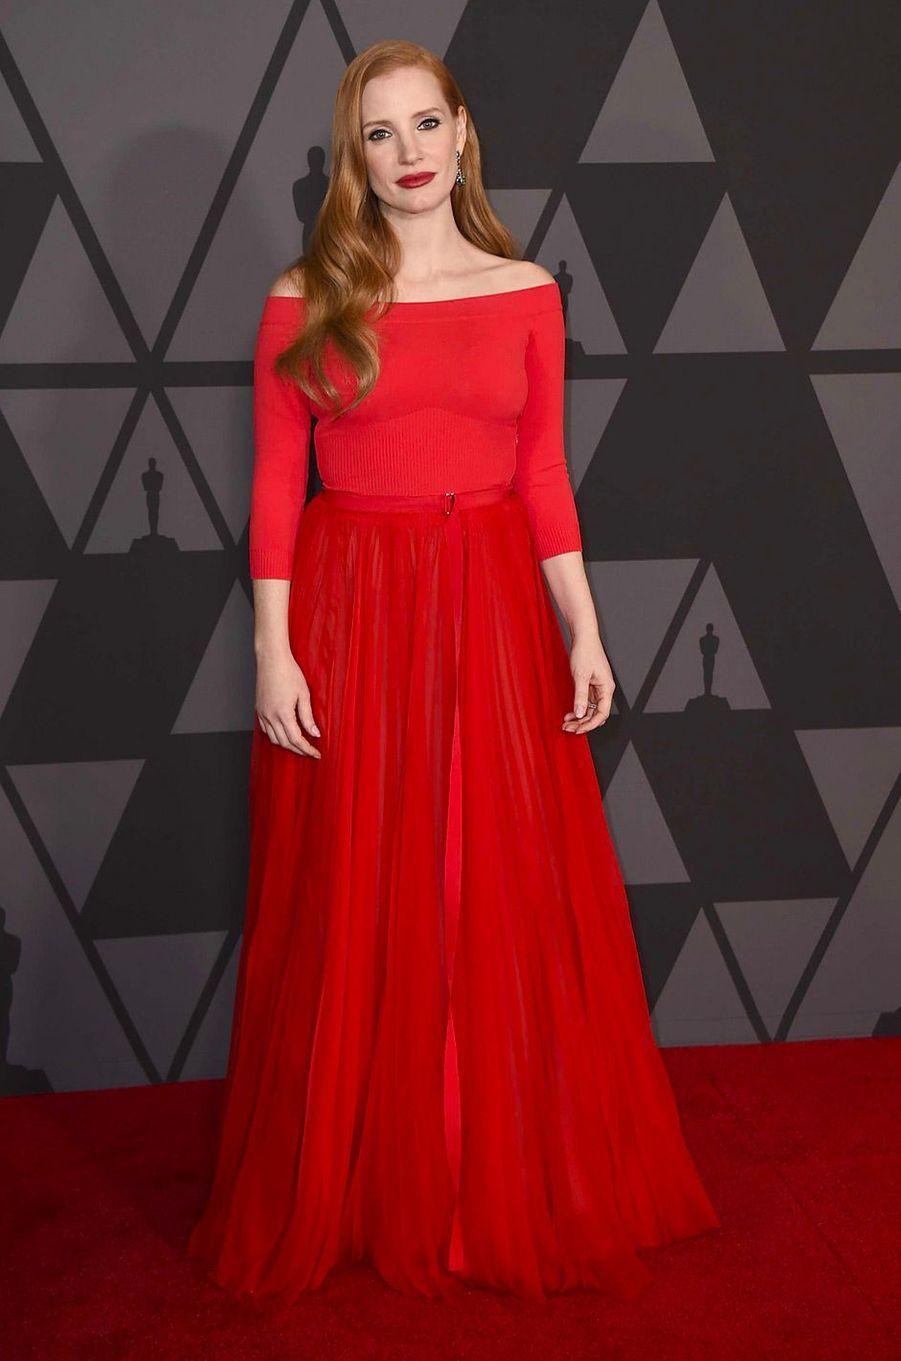 Jessica Chastainaux Governors Awards à Los Angeles, samedi 11 novembre